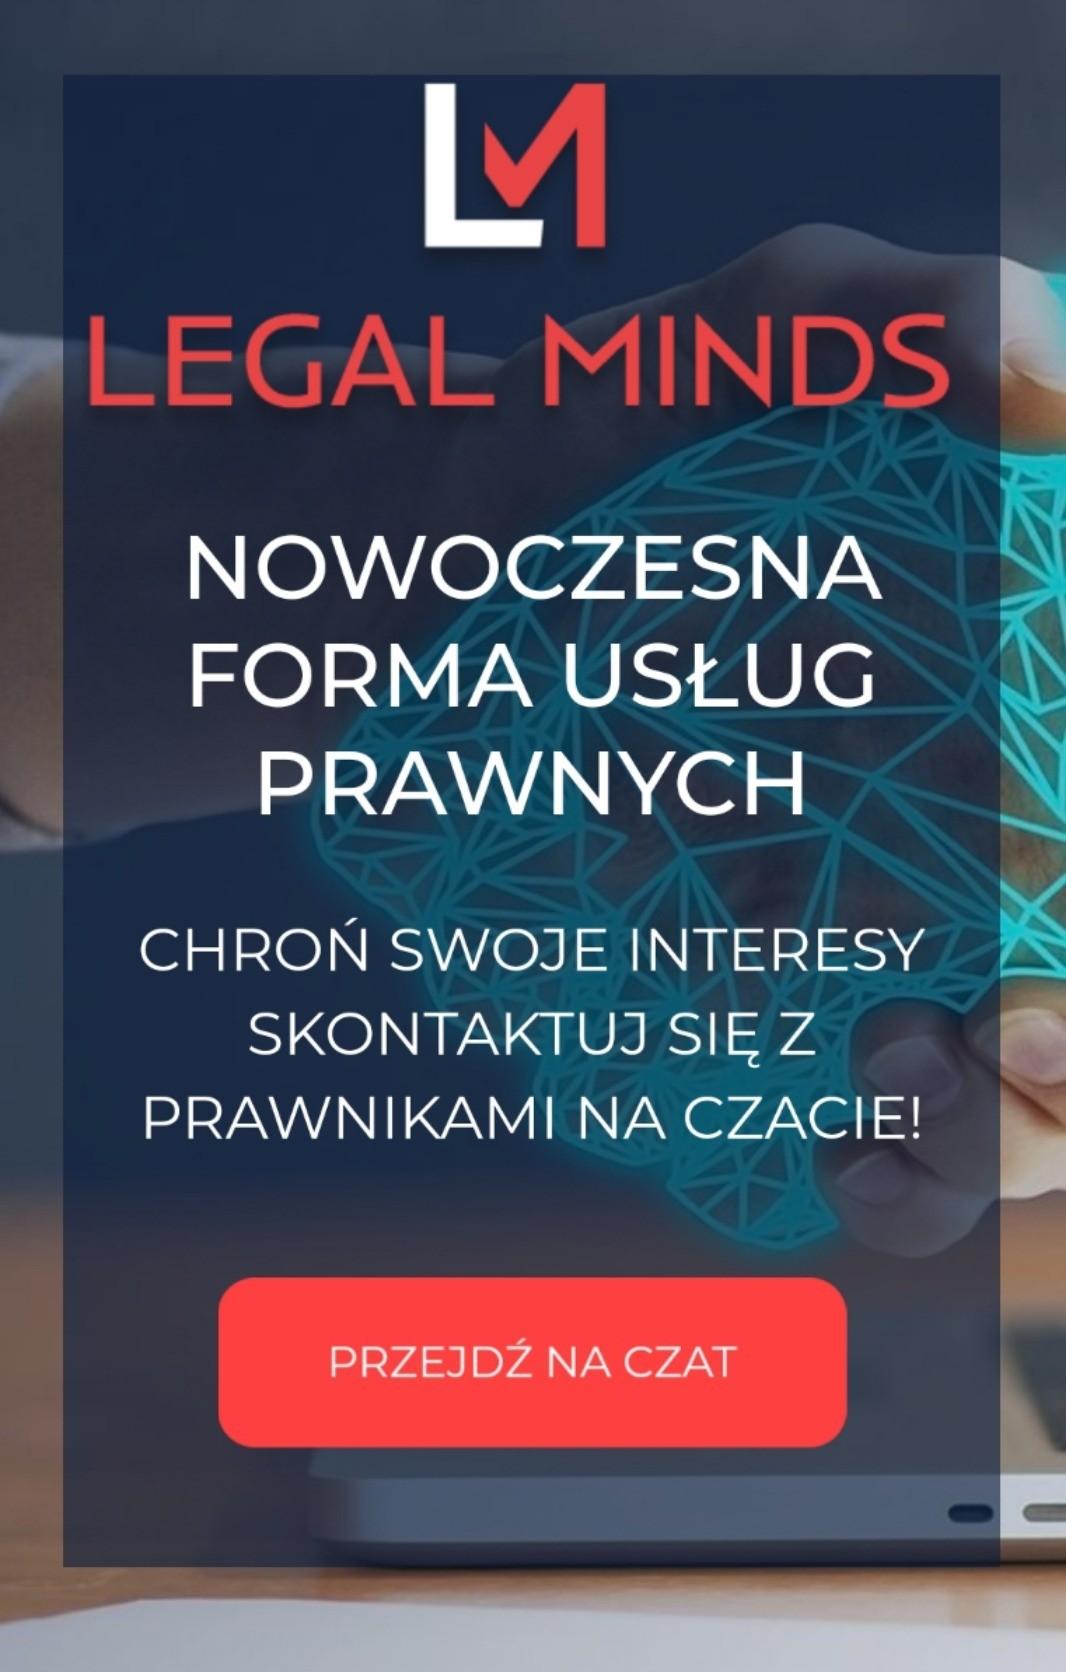 legal minds screenshot